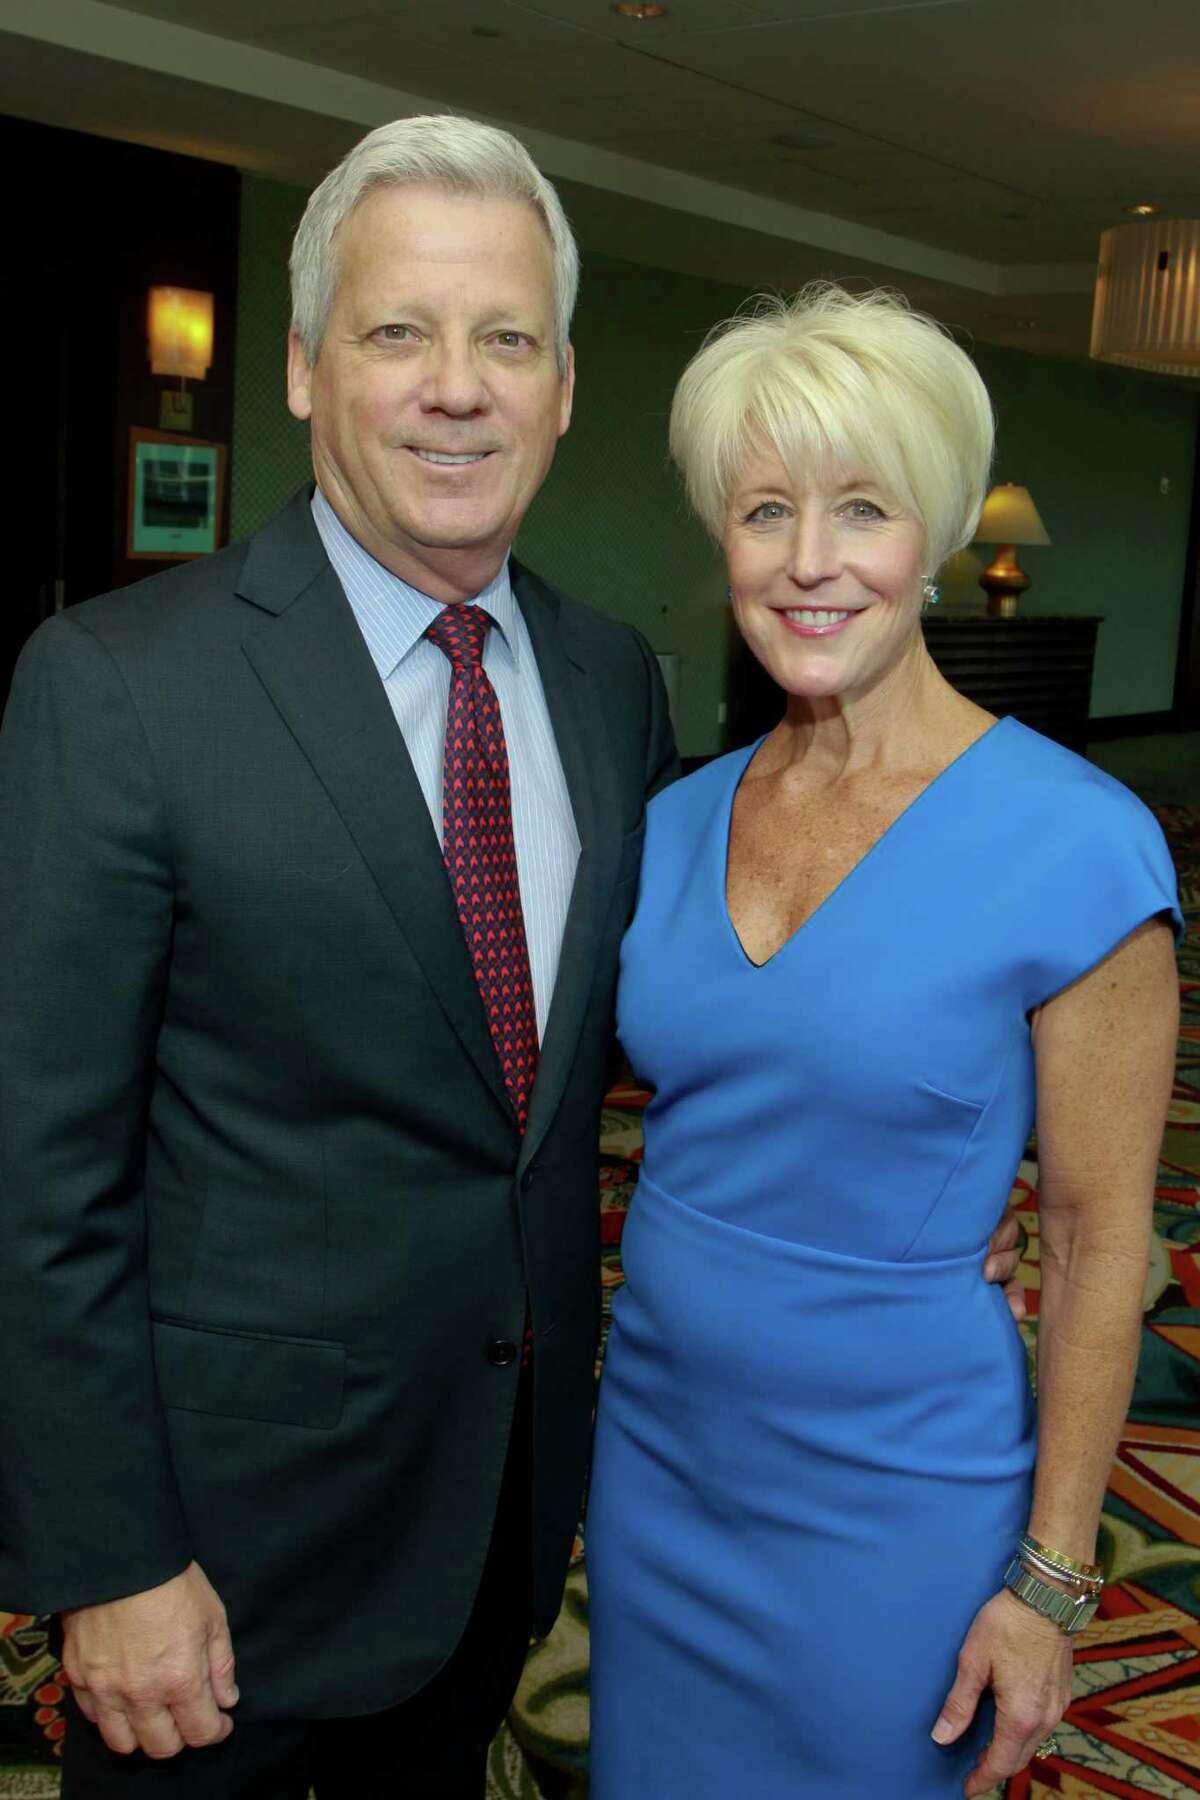 Co-chairs Jim and Carol Farnsworth